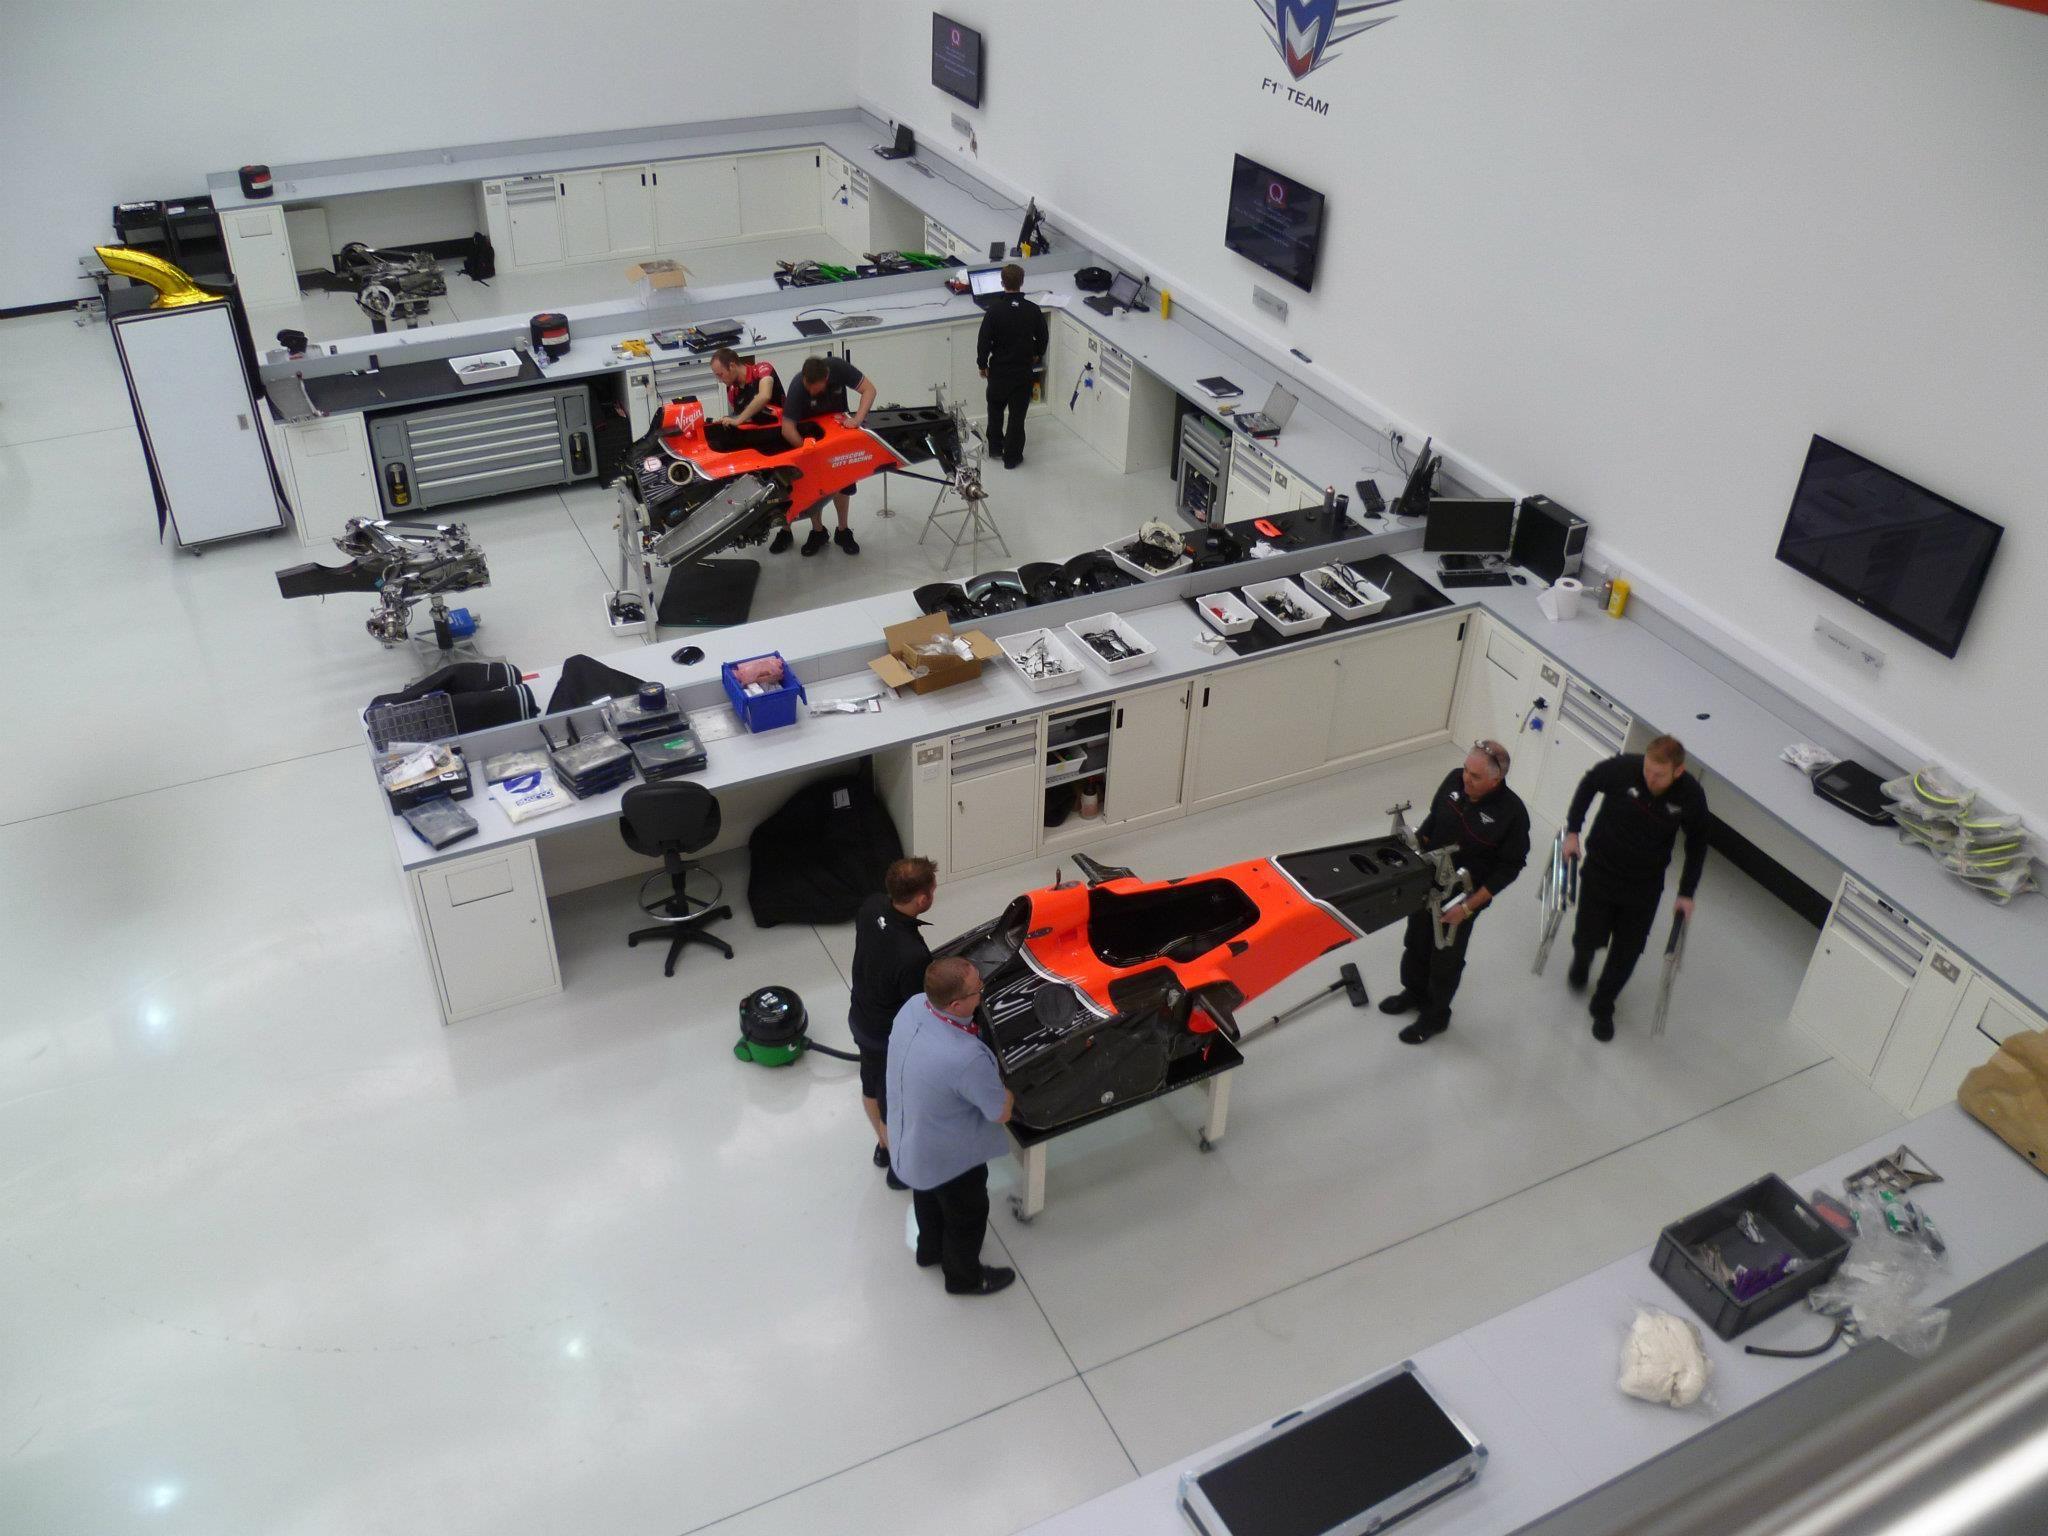 Marussia F1 factory tour | Car workshop, Car repair ...